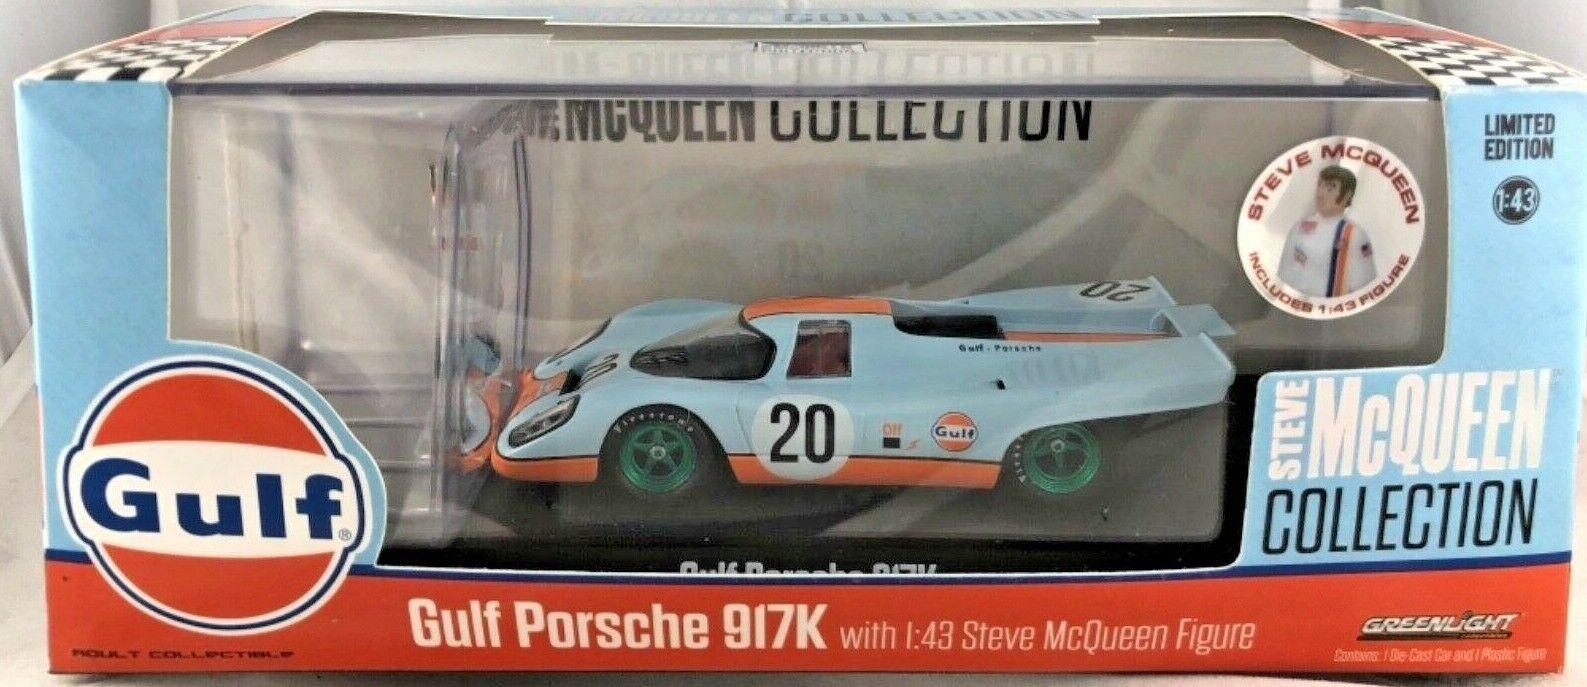 Máquina verde verdeLight Raro Chase 86435 Steve McQueen Gulf Porsche 917K 1 43